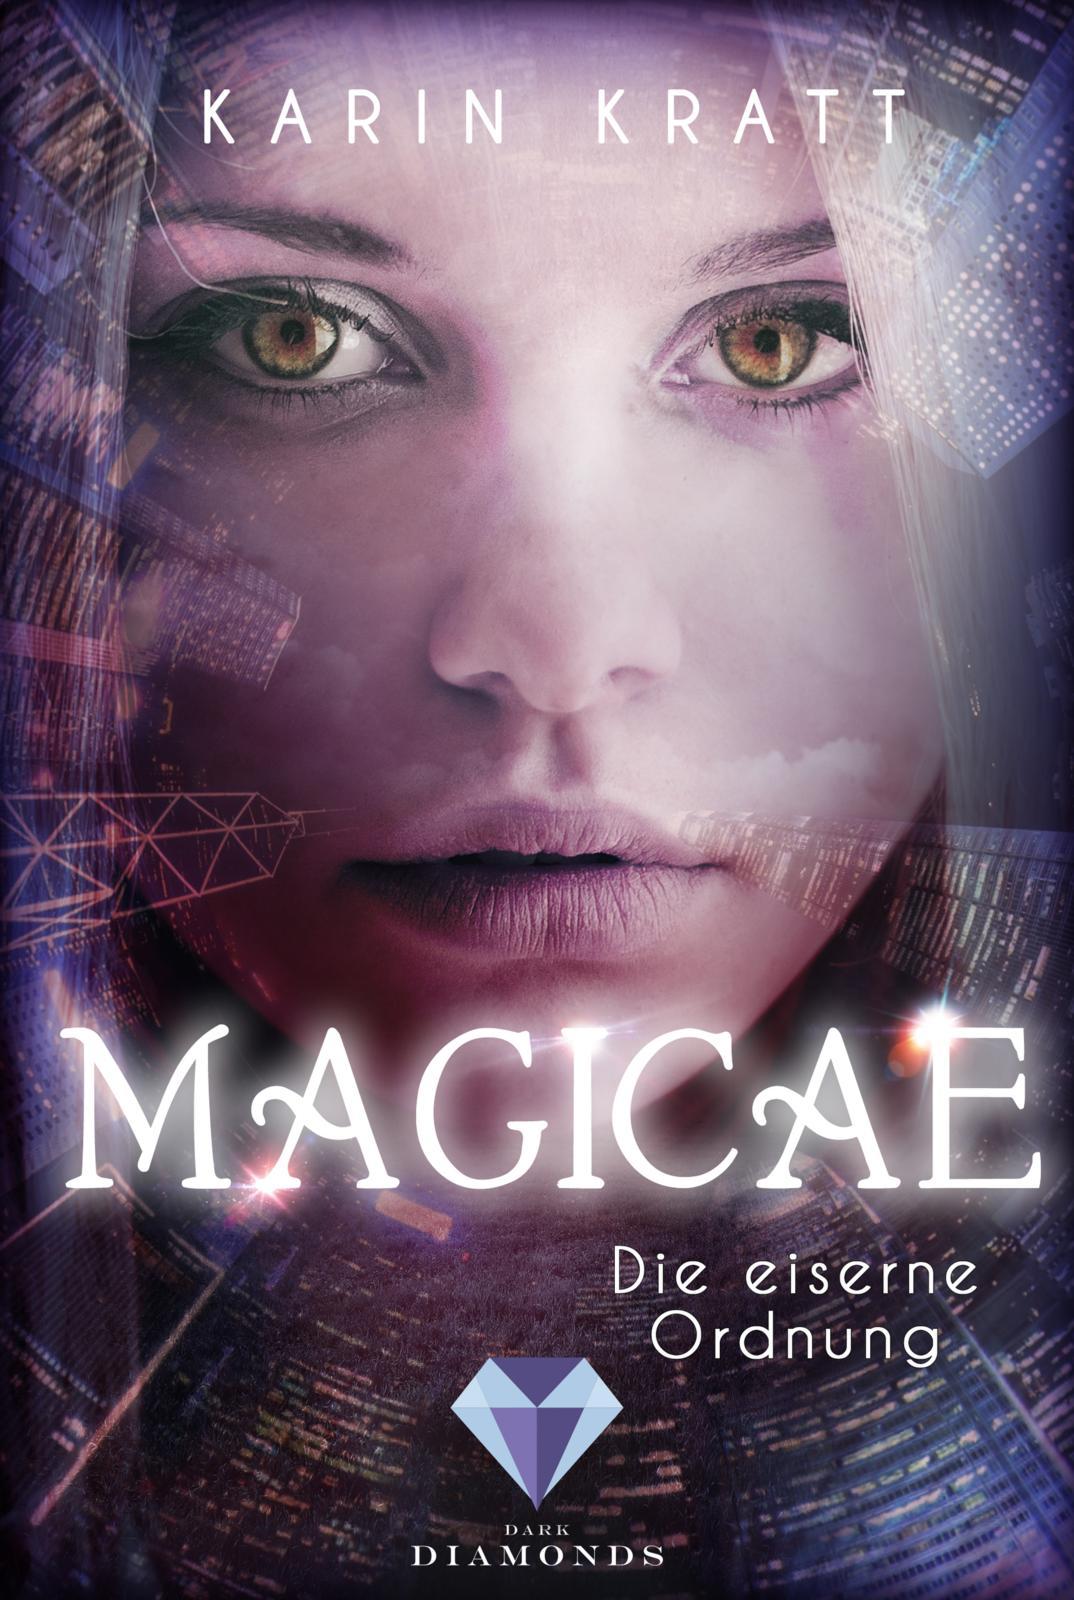 Magicae-Die eiserne Ordnung